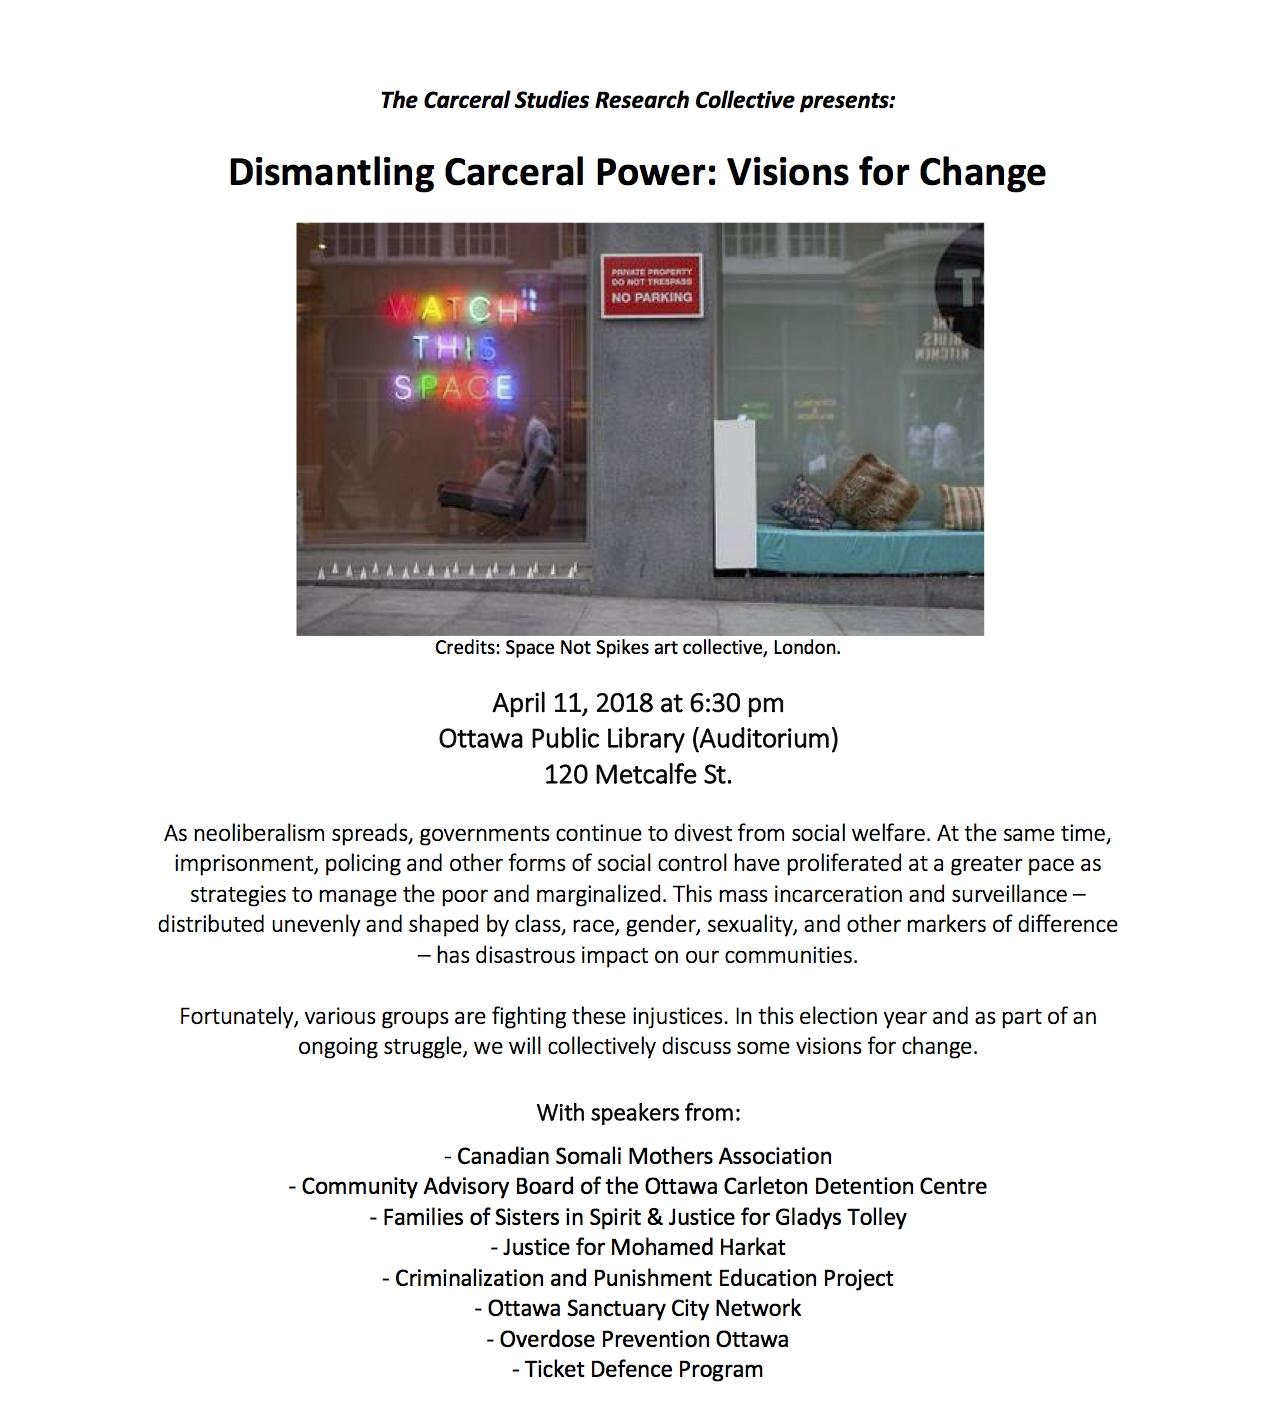 Dismantling Carceral Power copy.jpg